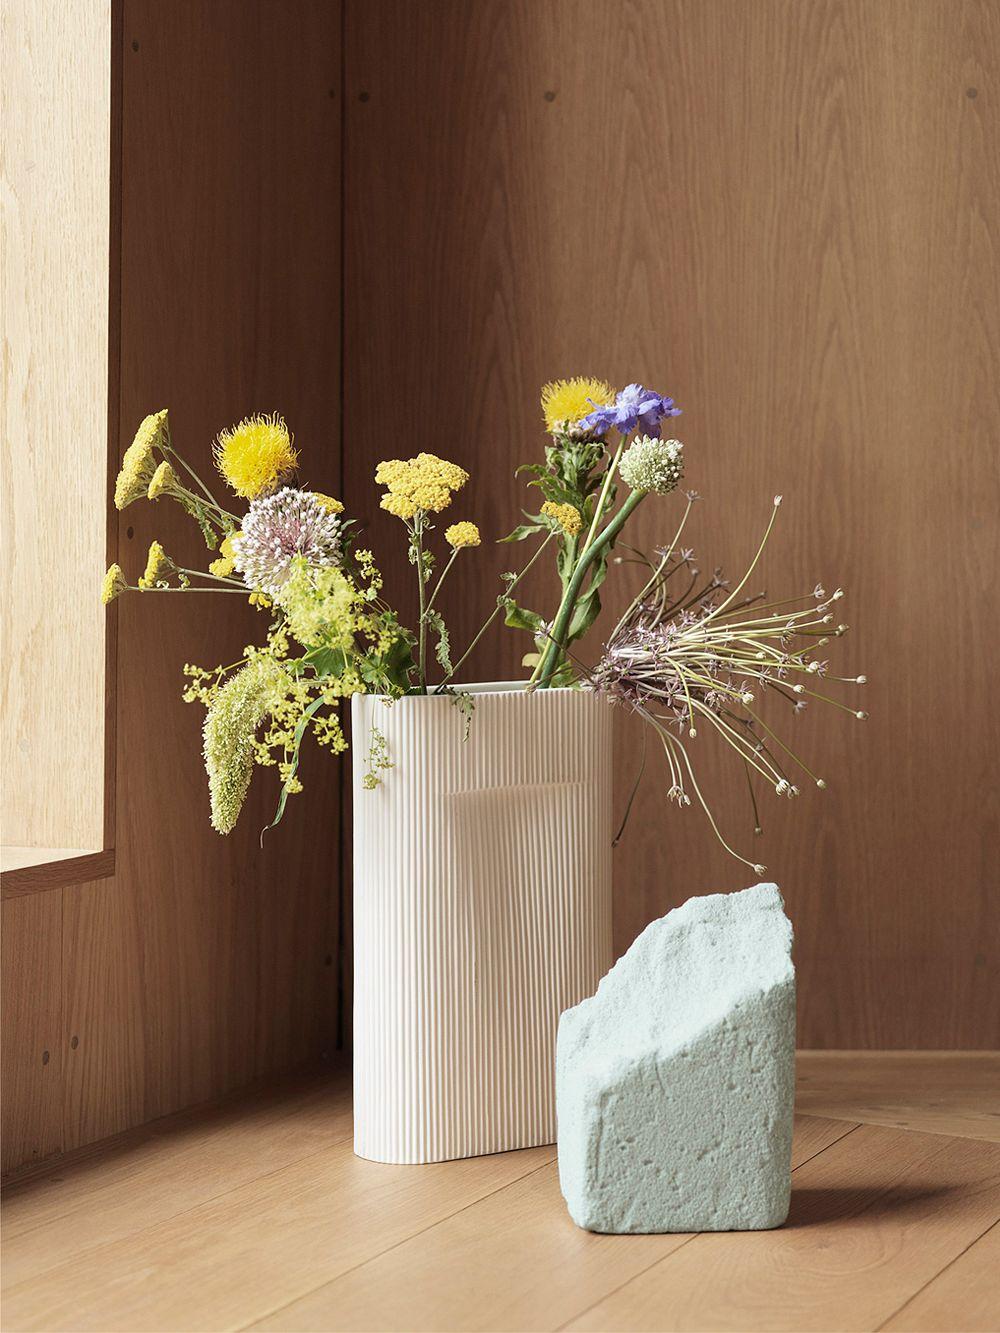 Muuto's Ridge vase, off-white